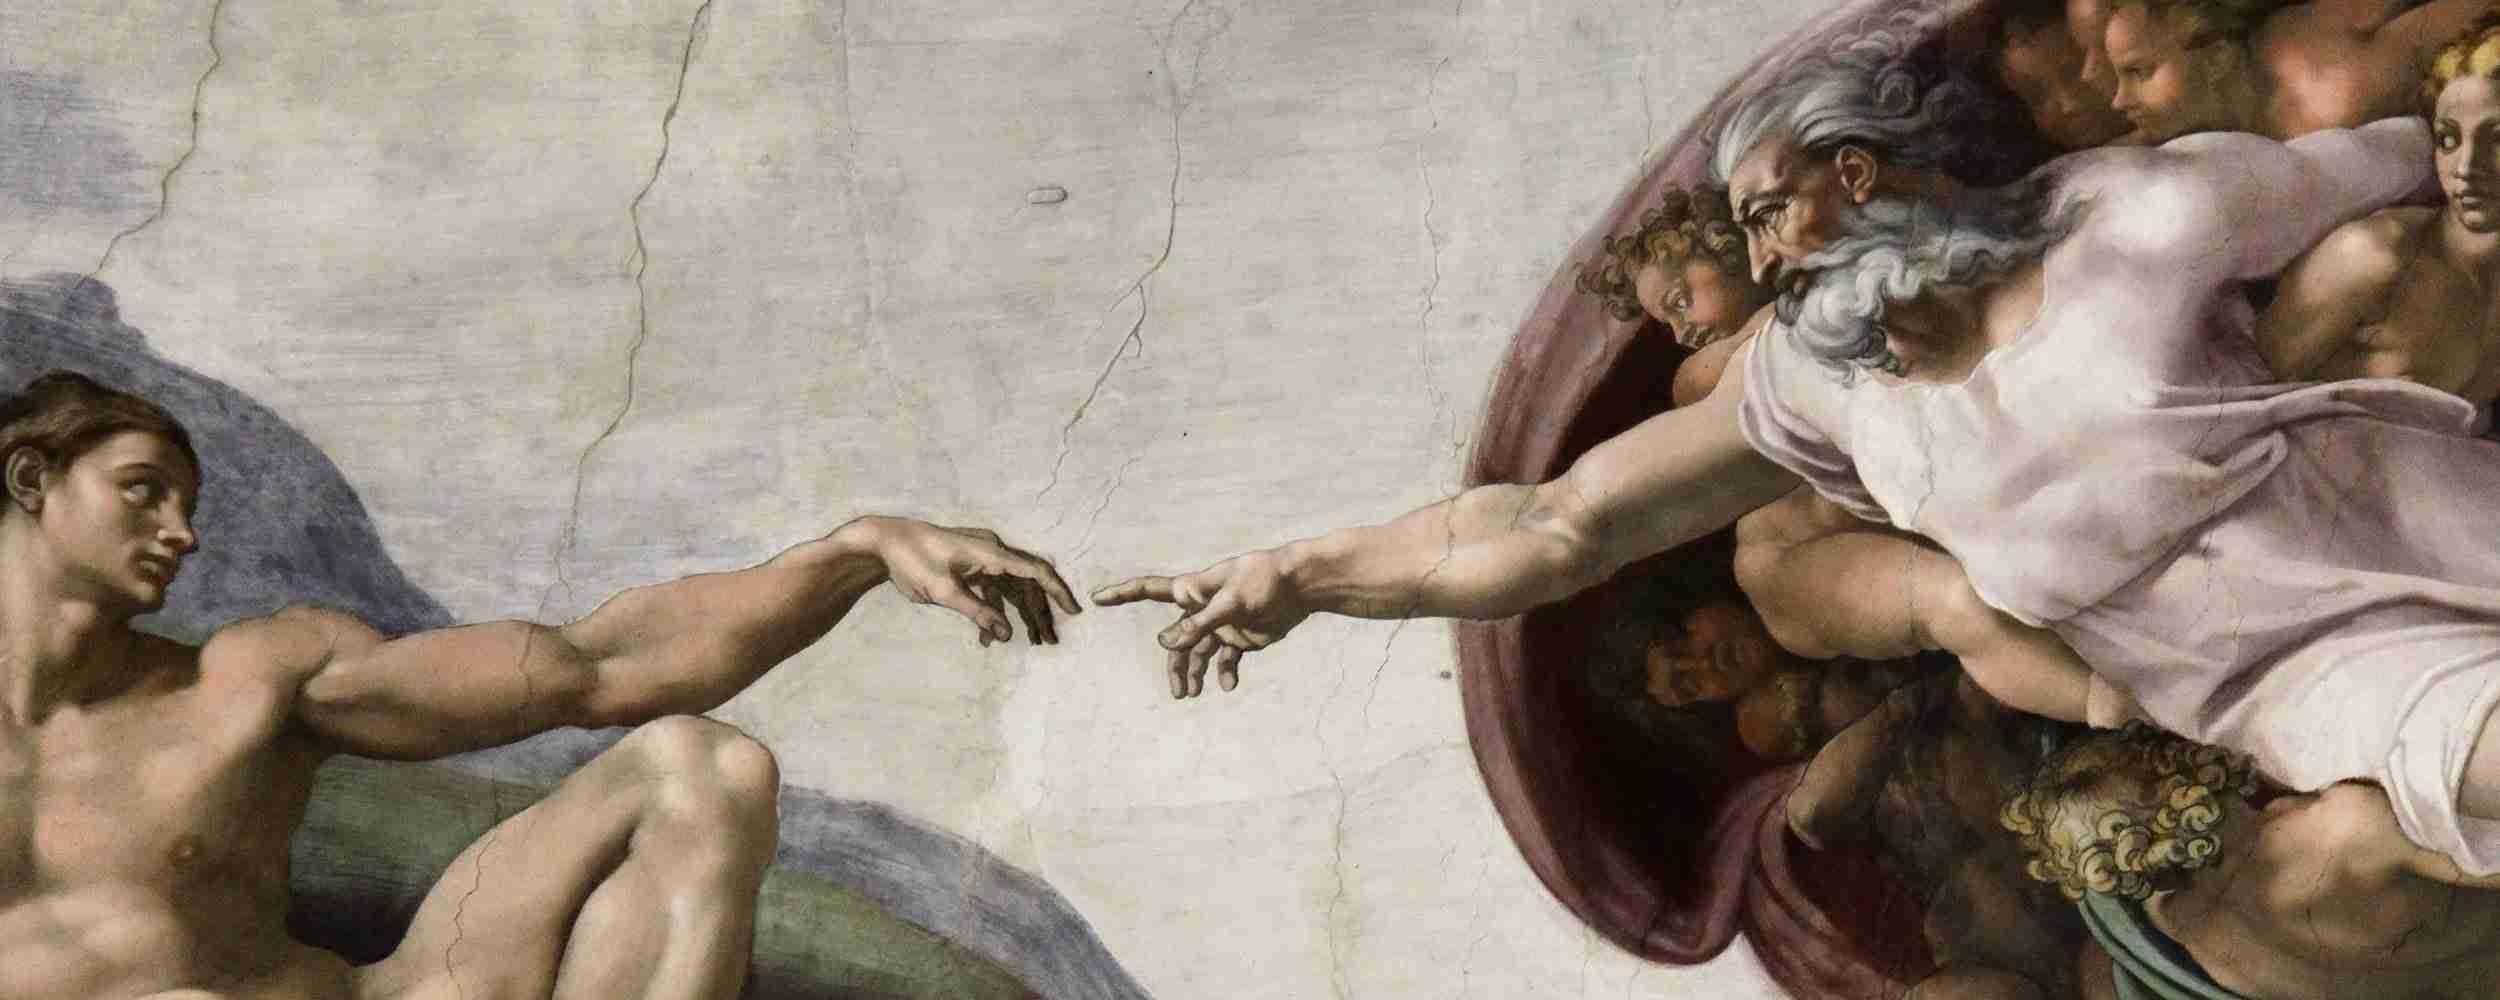 Visita Guidata il Venerdì sera ai Musei Vaticani